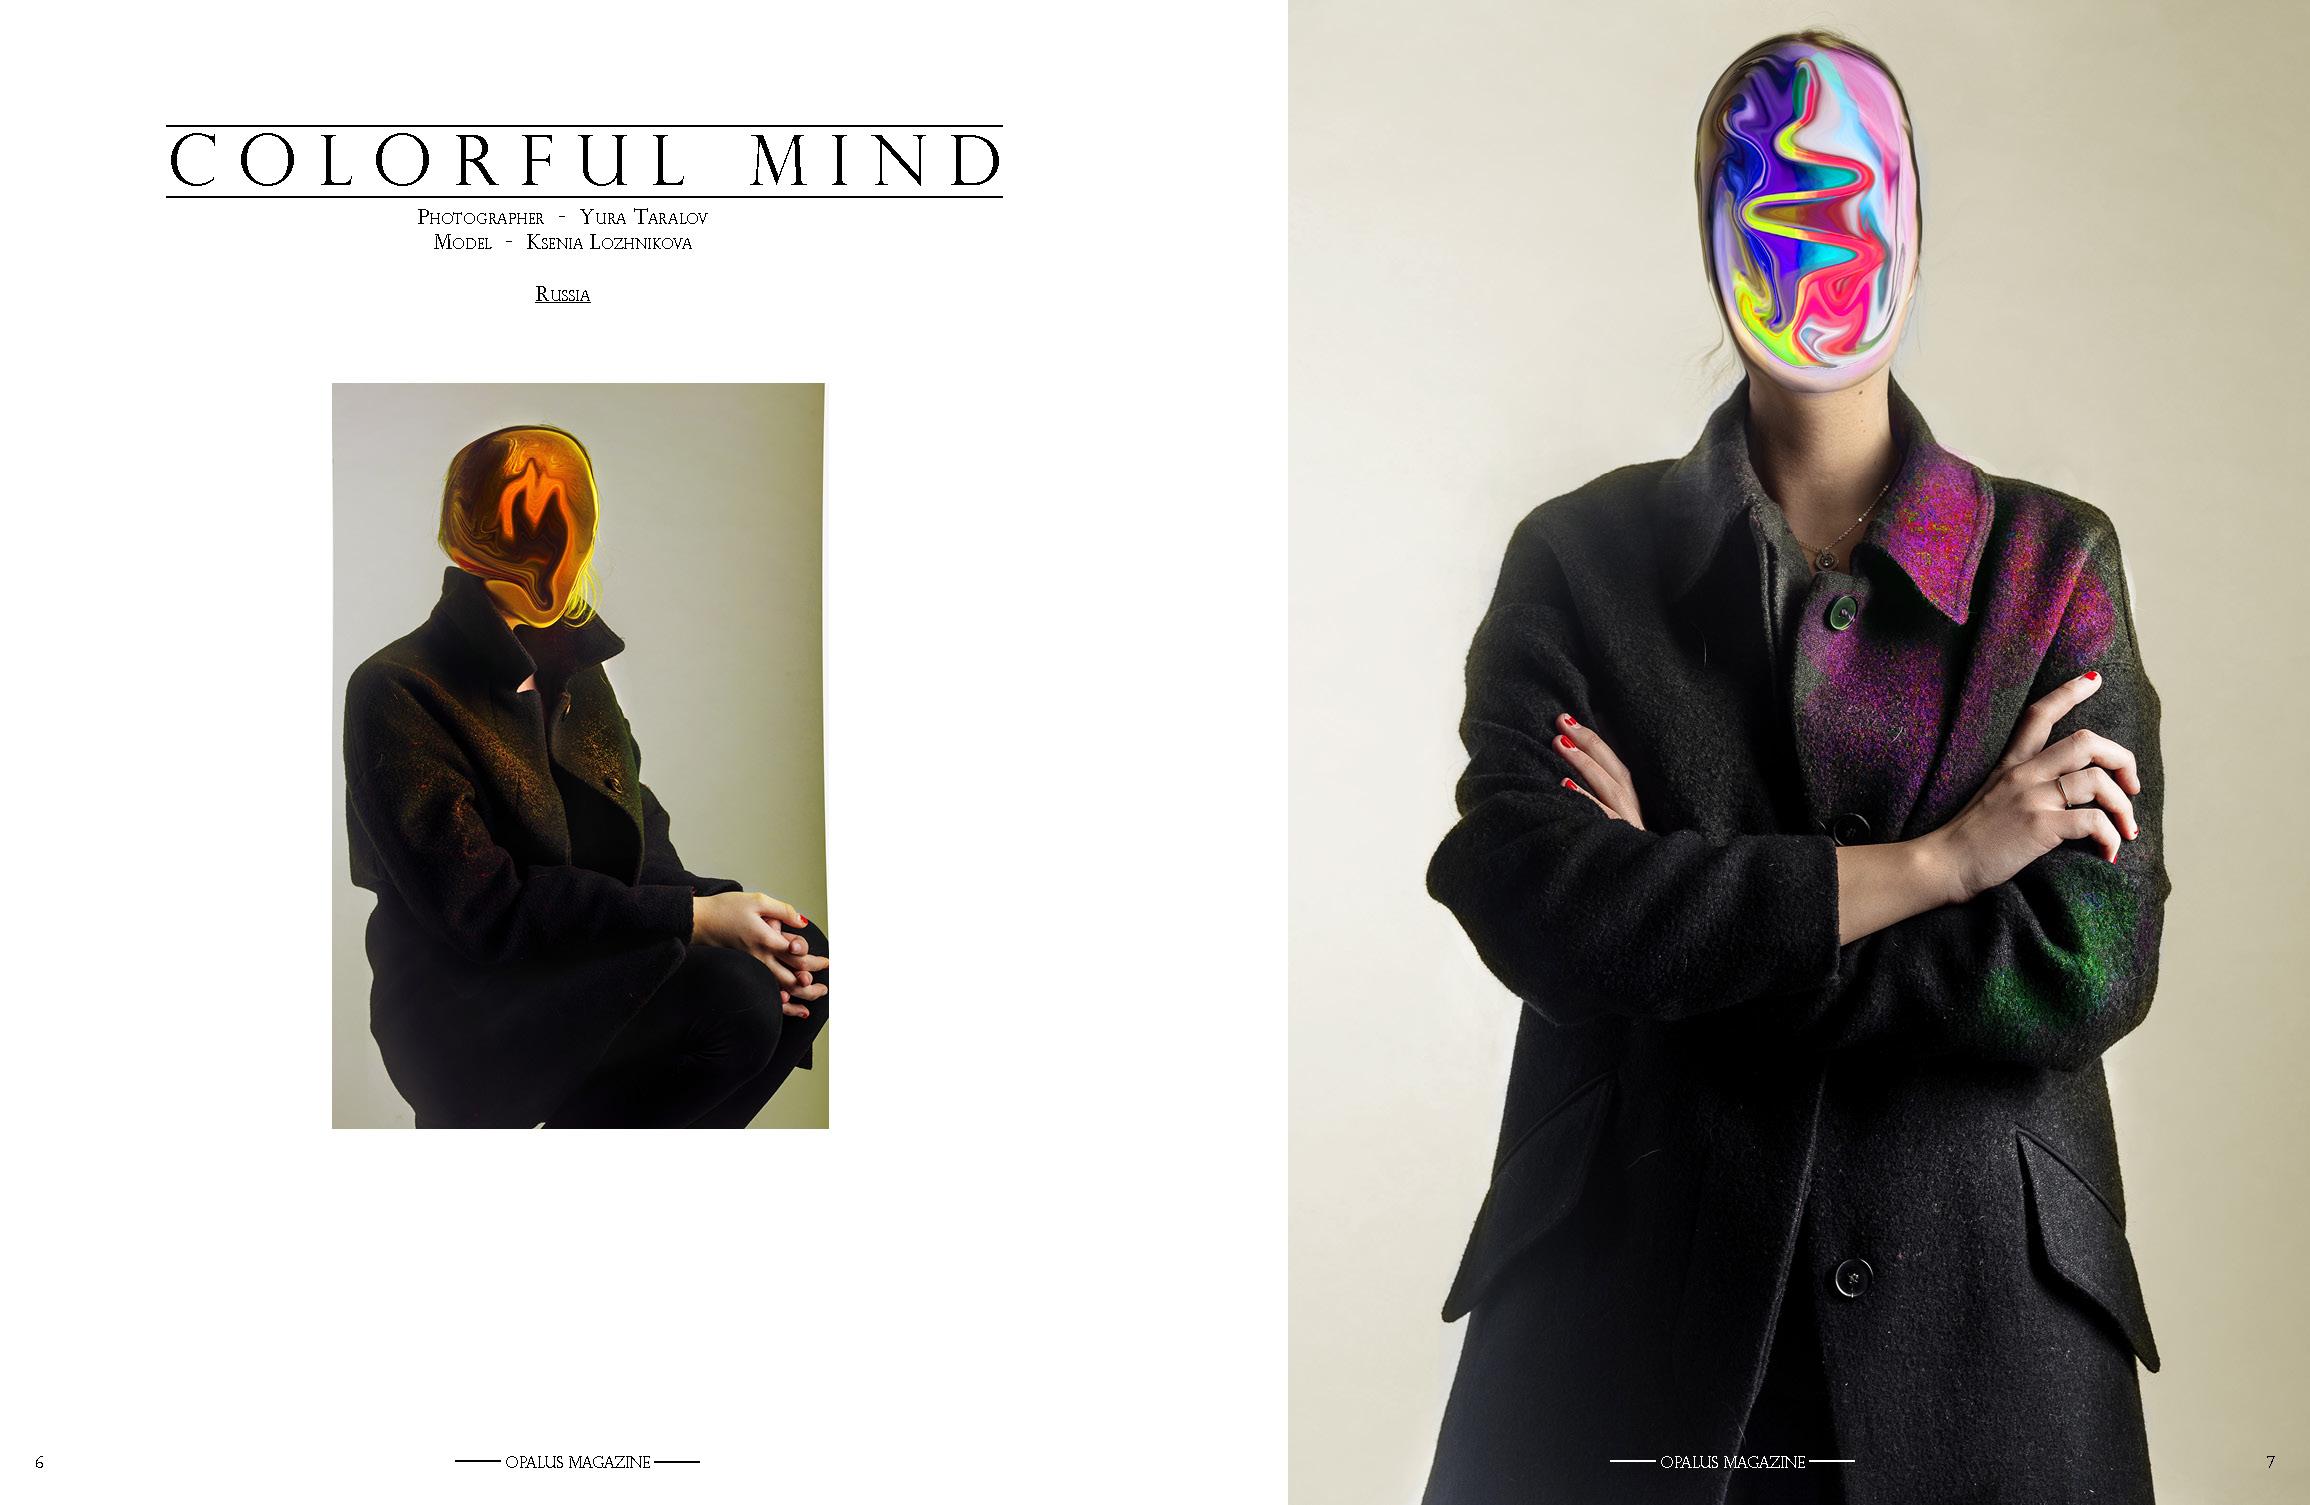 OPALUS_MAGAZINE_ISSUE_4_COLORFUL_MIND.jpg